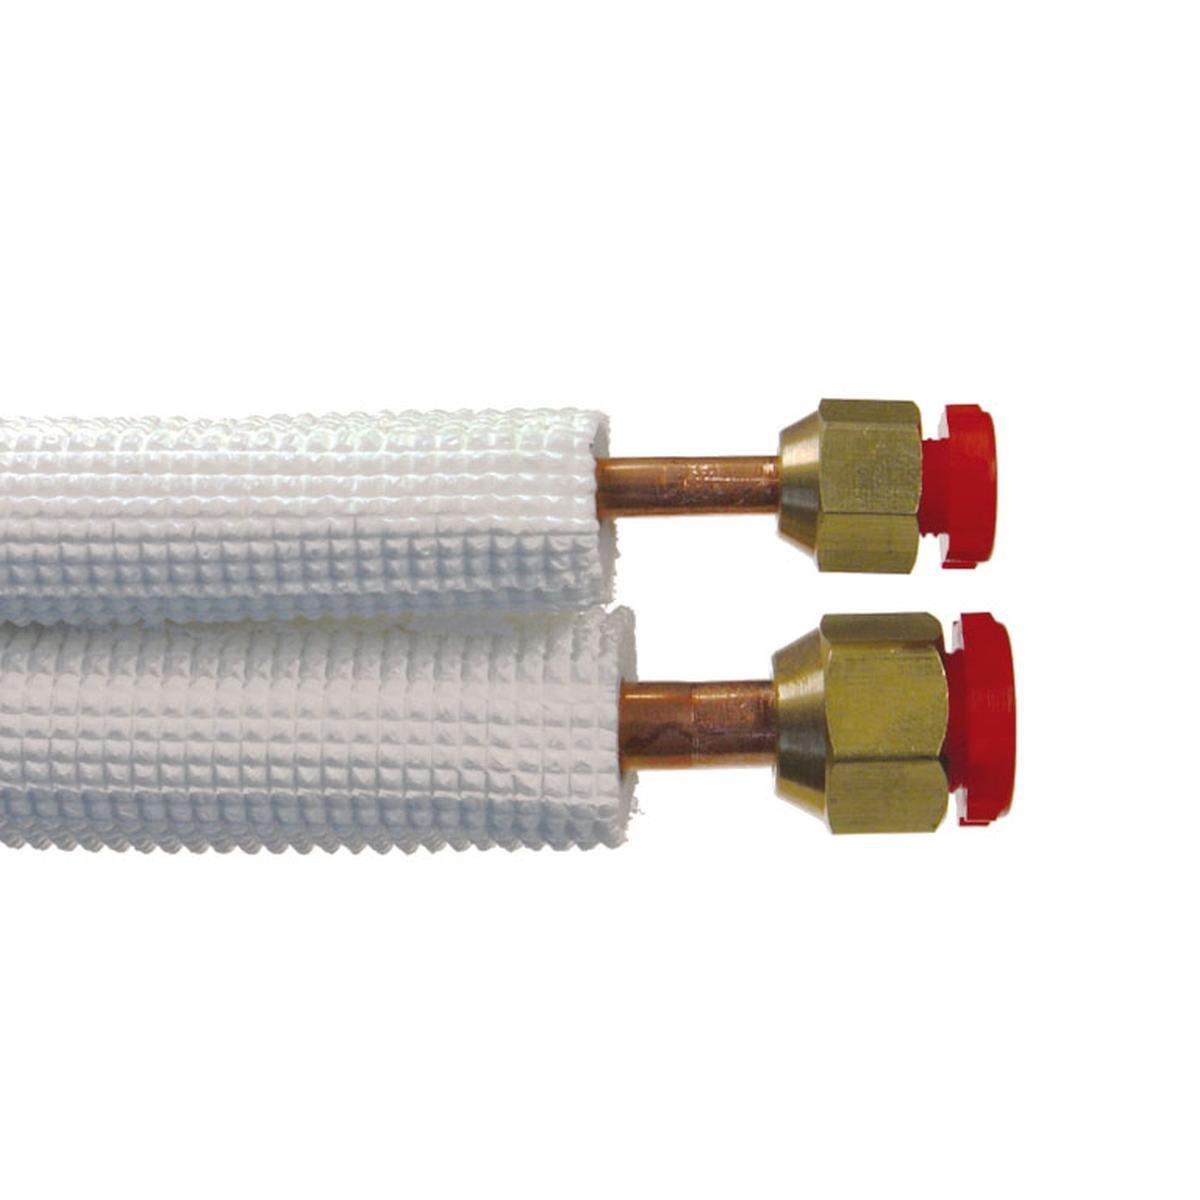 "Kopparrör isolerad dobb. 1/4""+3/8"" x 0,8 mm. 3 met"